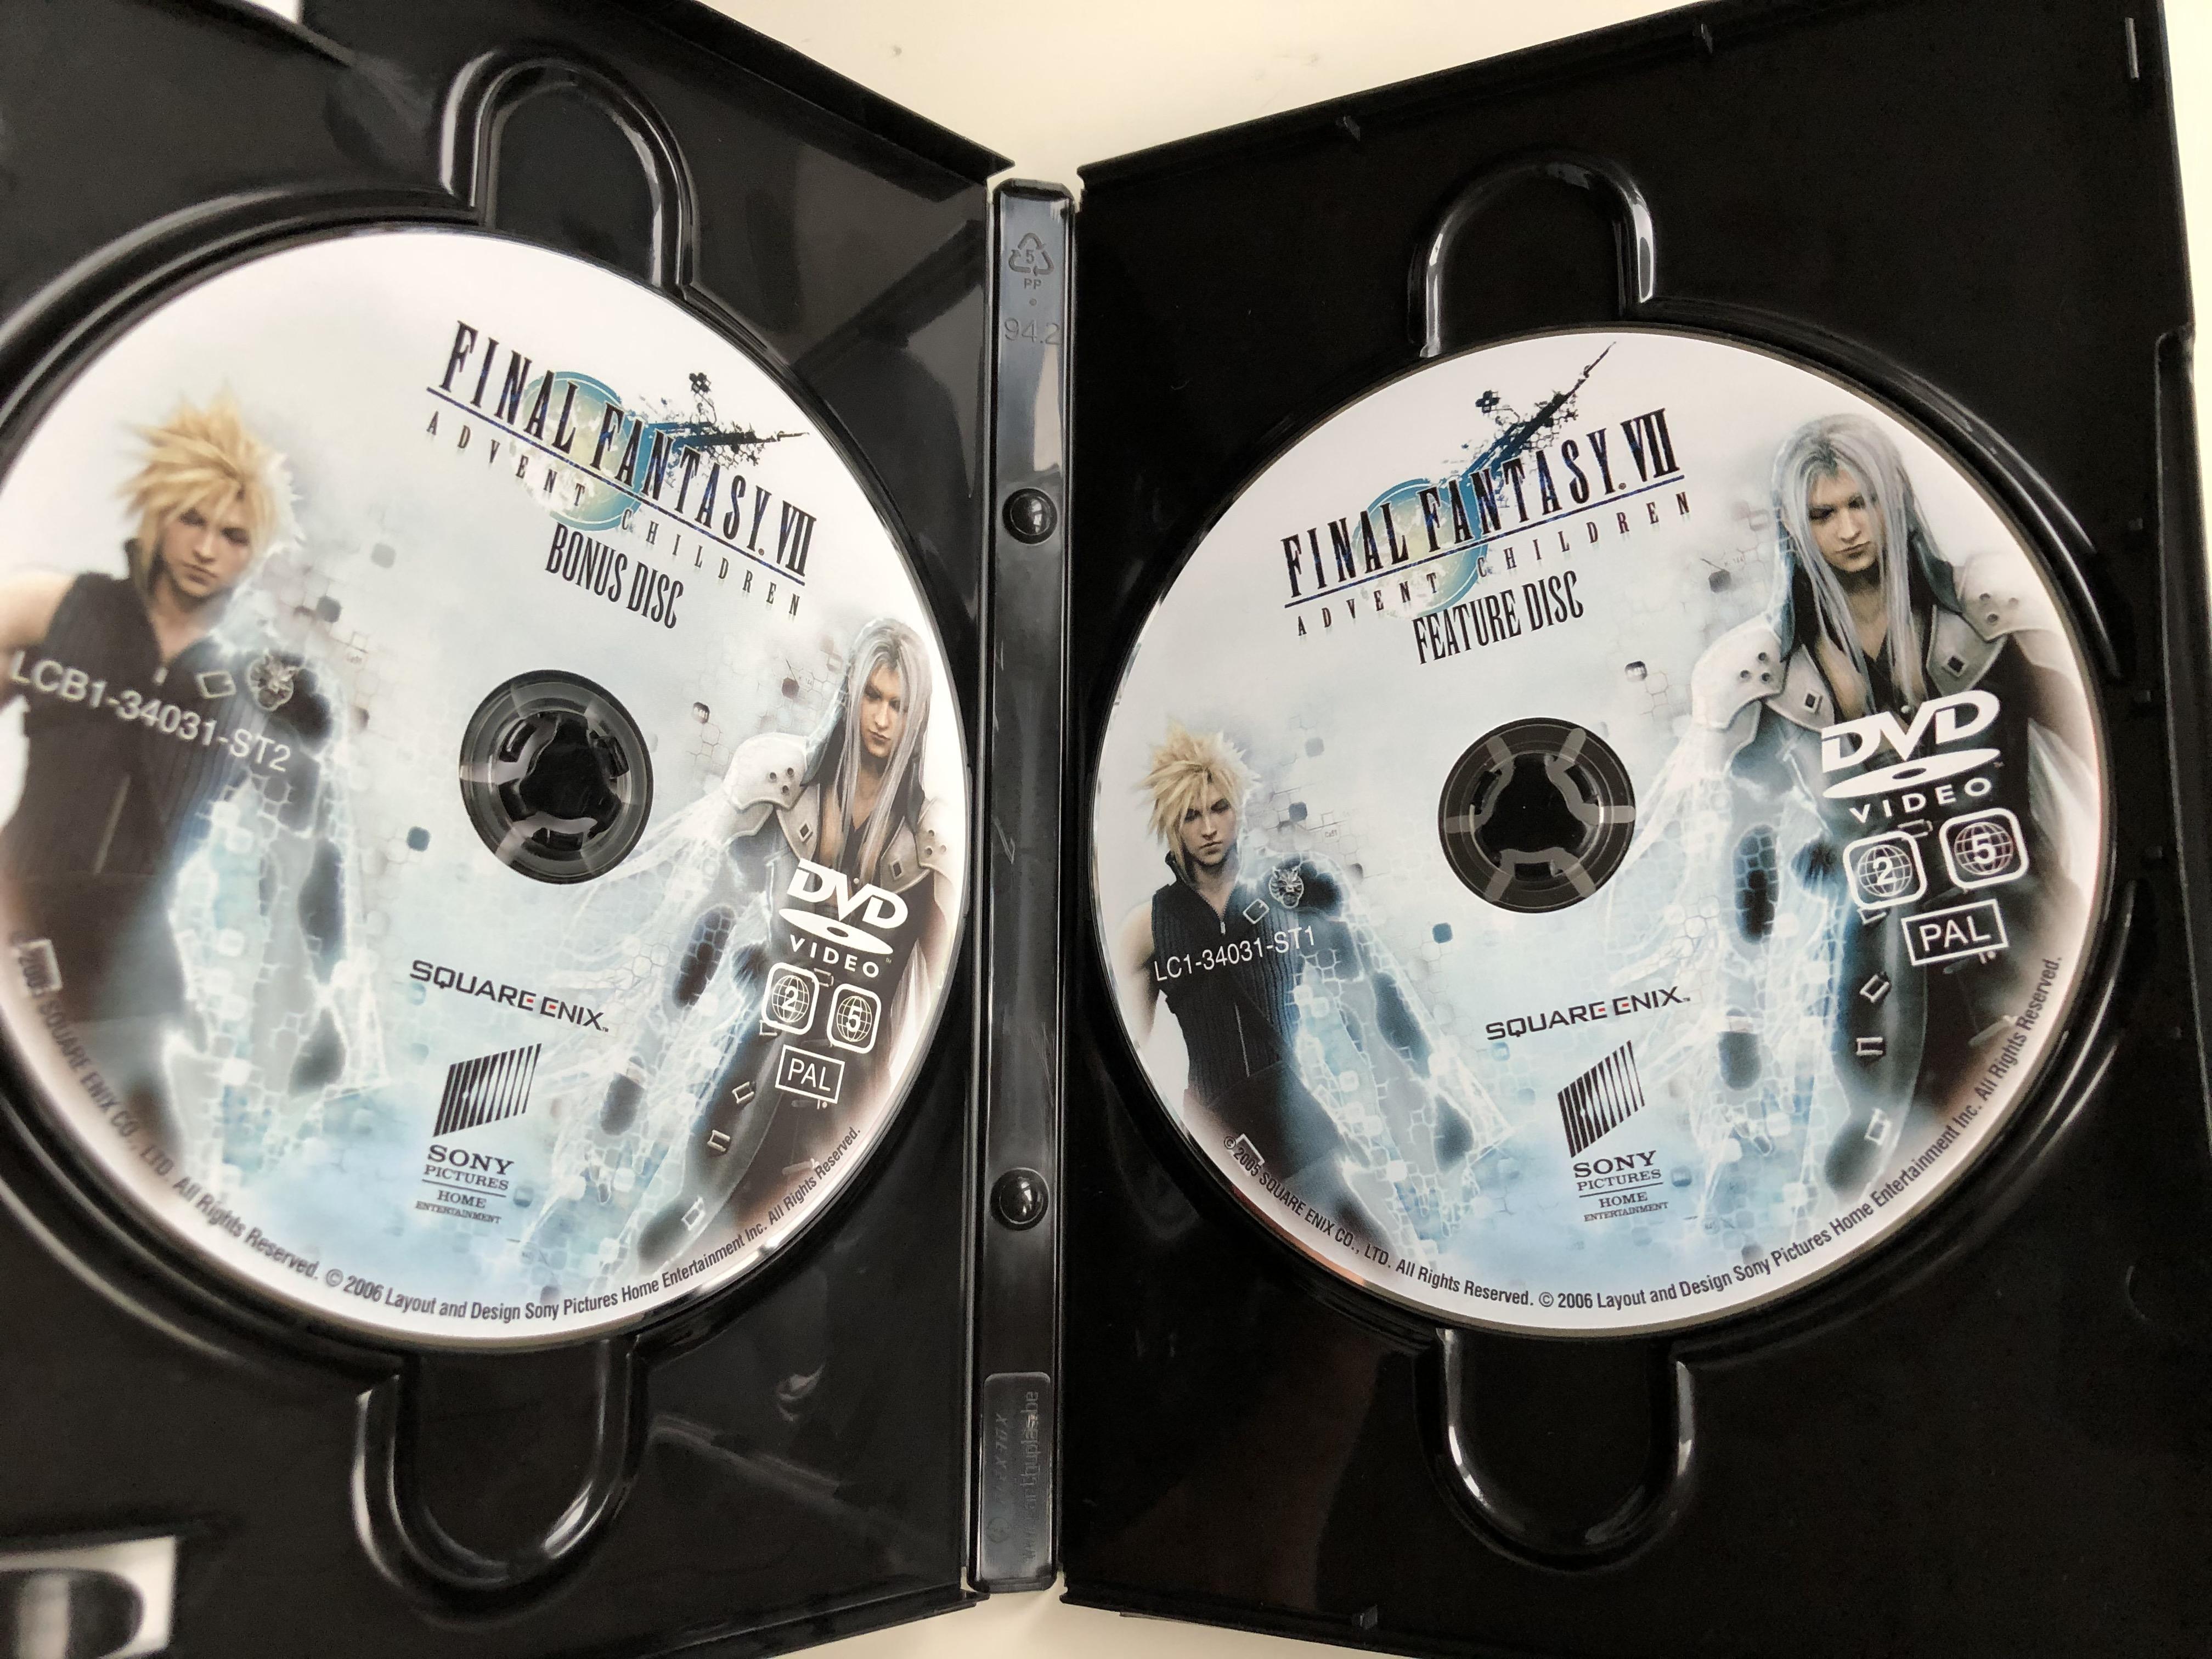 final-fantasy-vii-advent-children-dvd-cloud-visszat-r-duplalemezes-extra-v-ltozat-directed-by-tetsuya-nomura-2.jpg